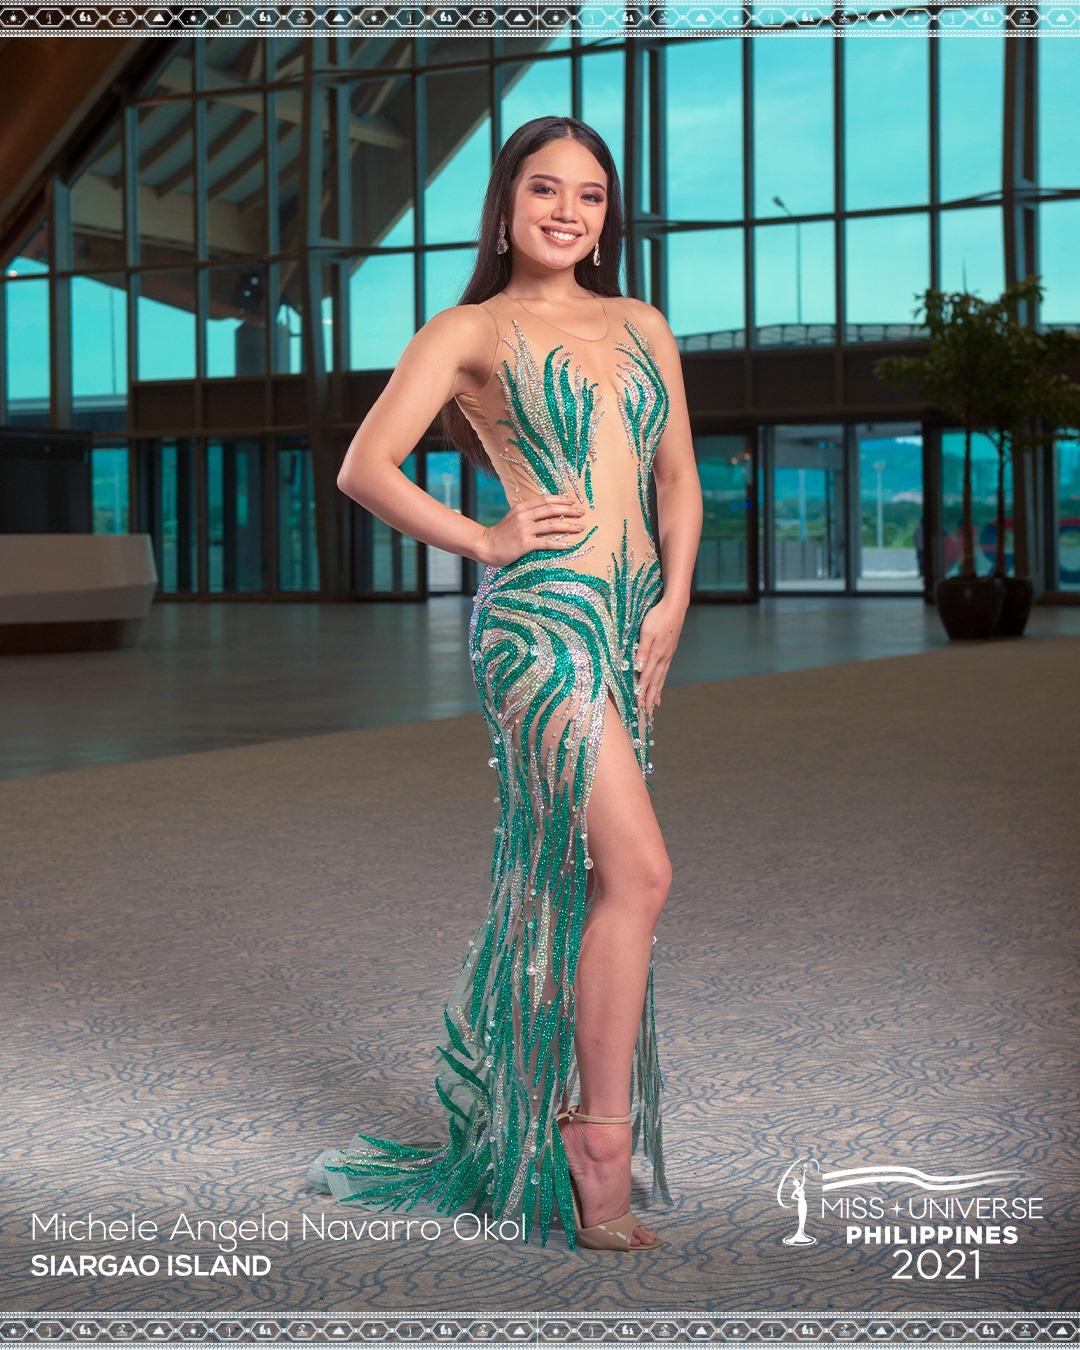 michele-angela-navarro-okol-miss-siargao-evening-gown